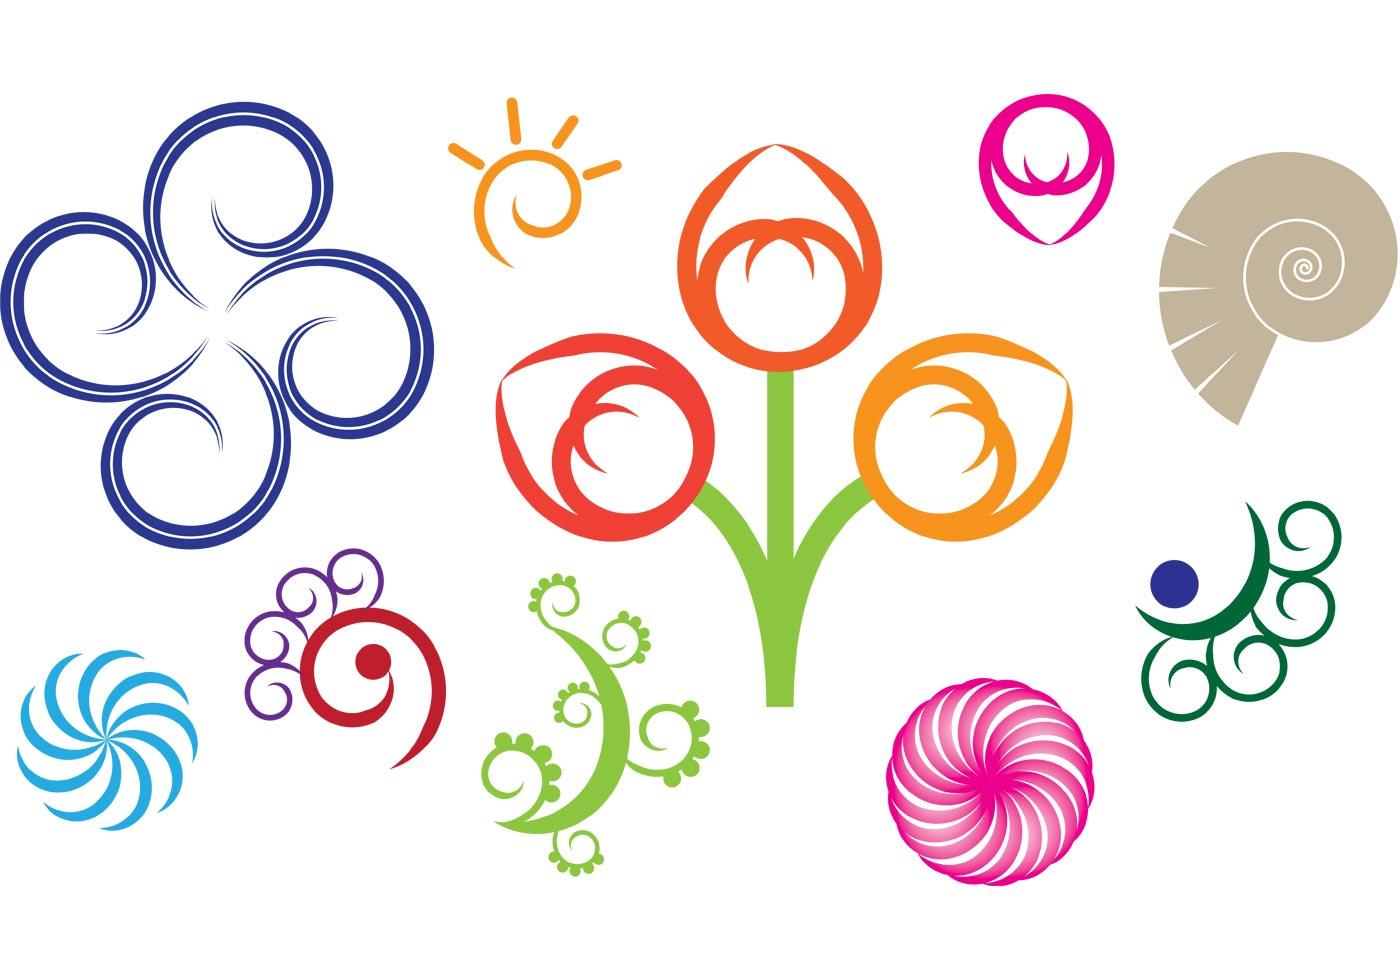 Free Swirls Vector Resources Download Free Vector Art